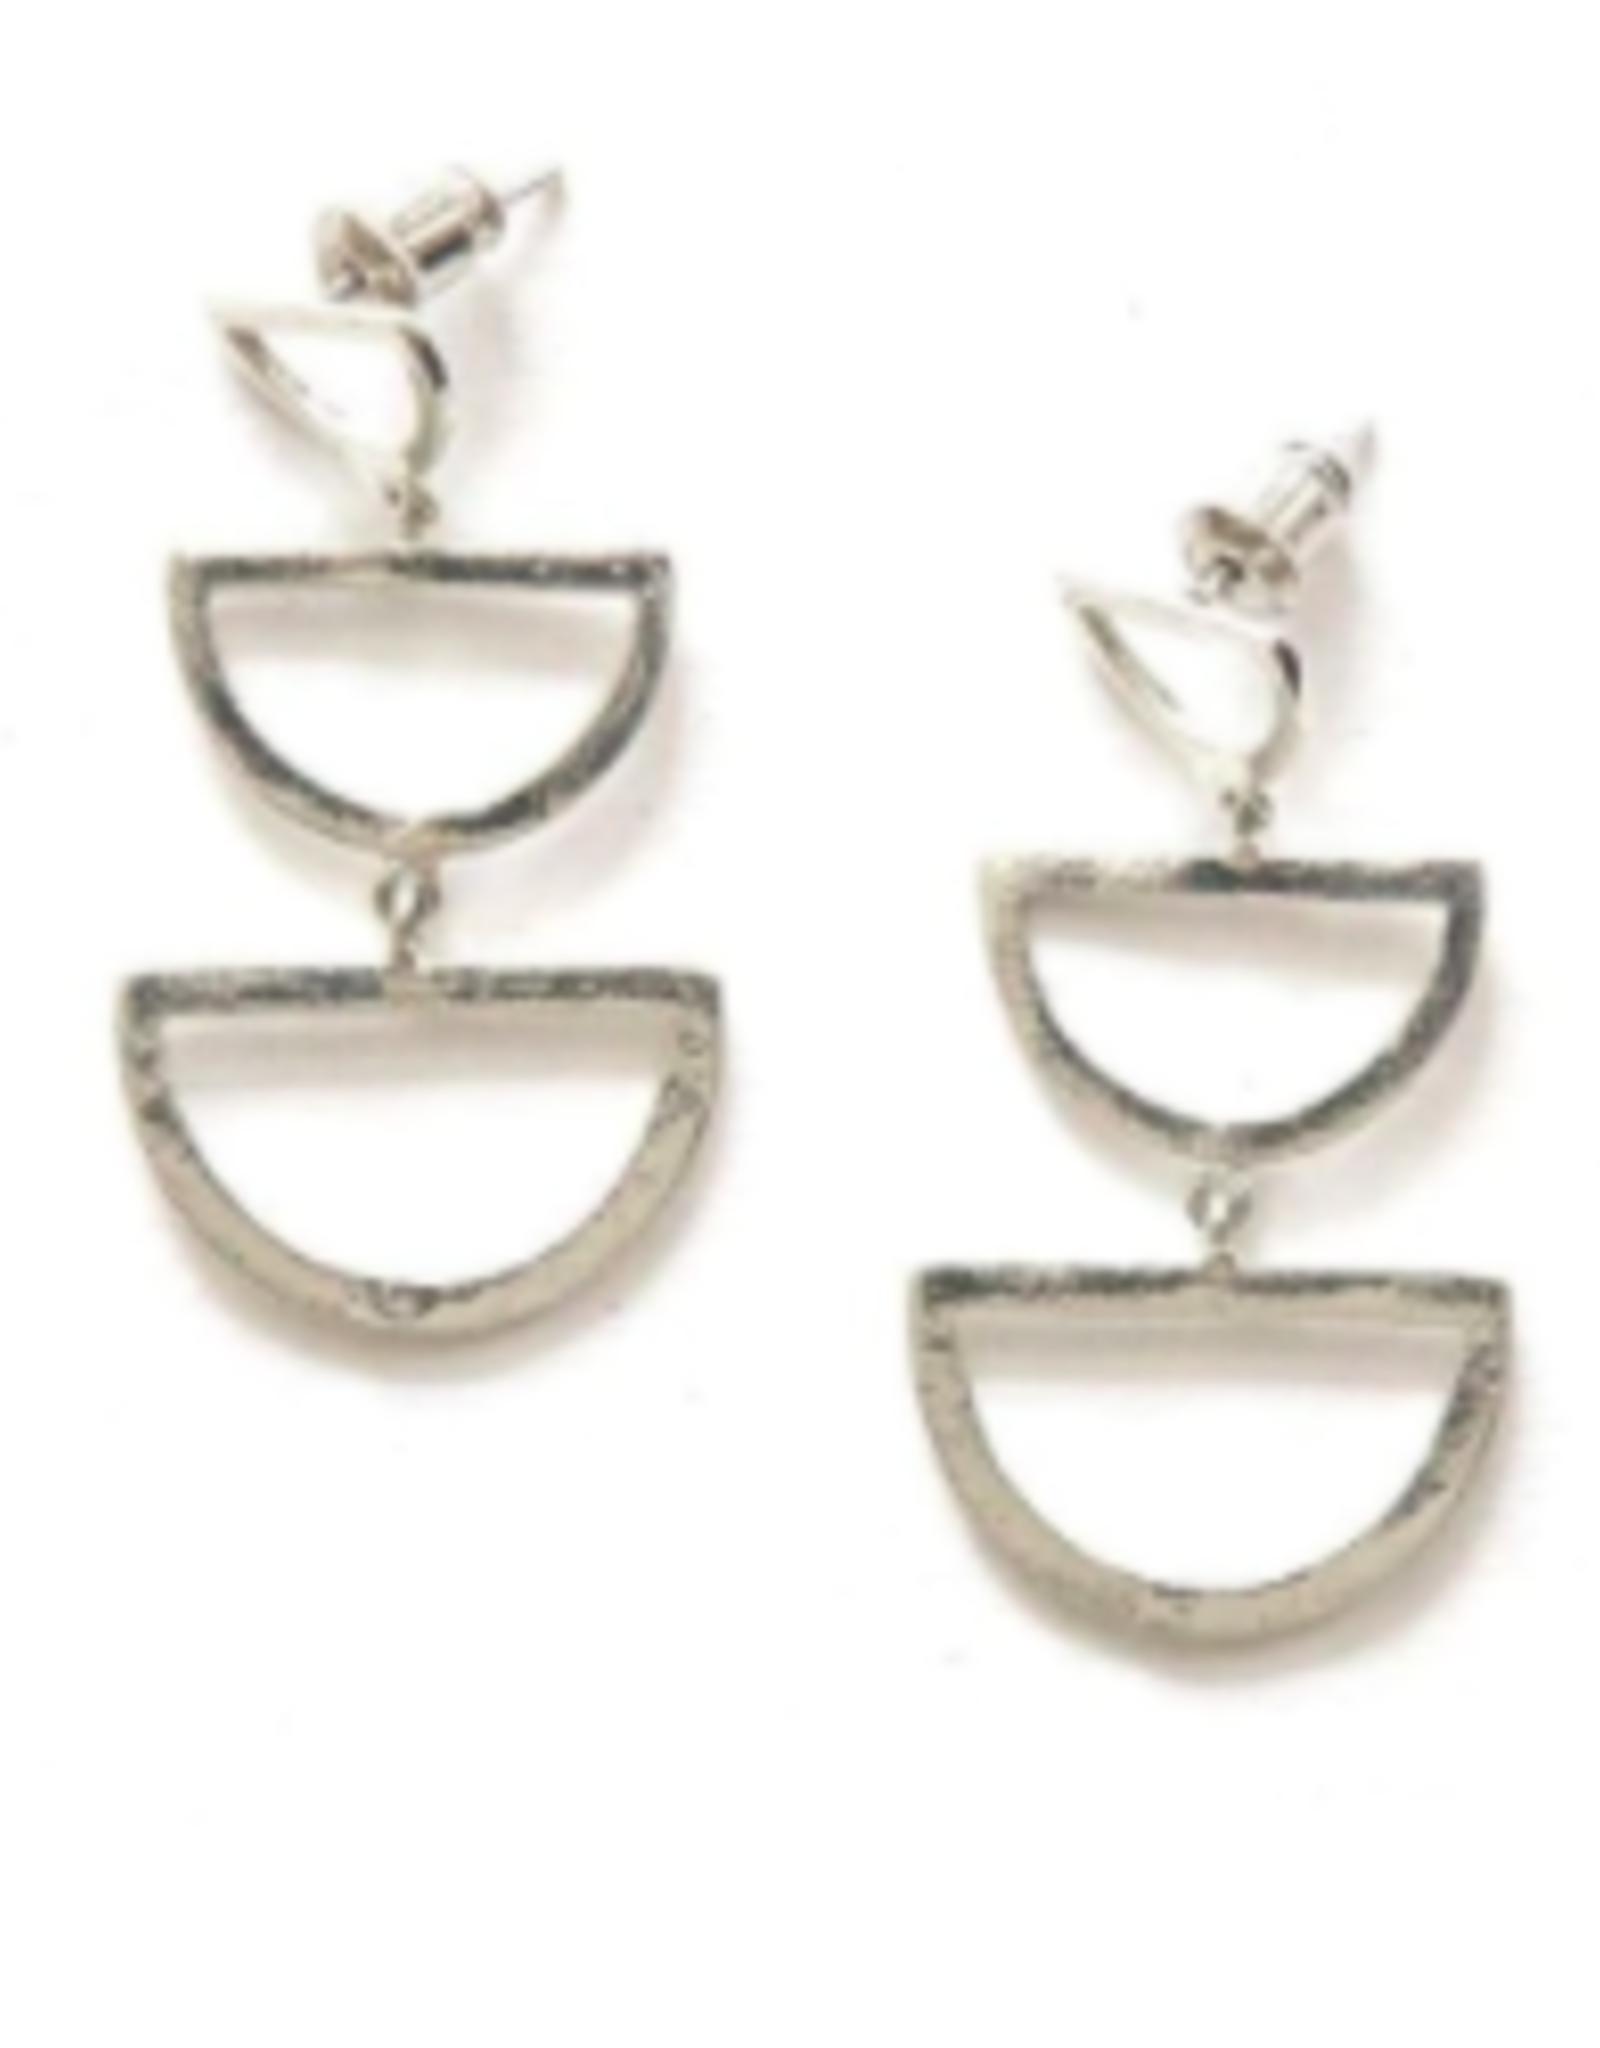 Reverberation Stud Earrings Silver